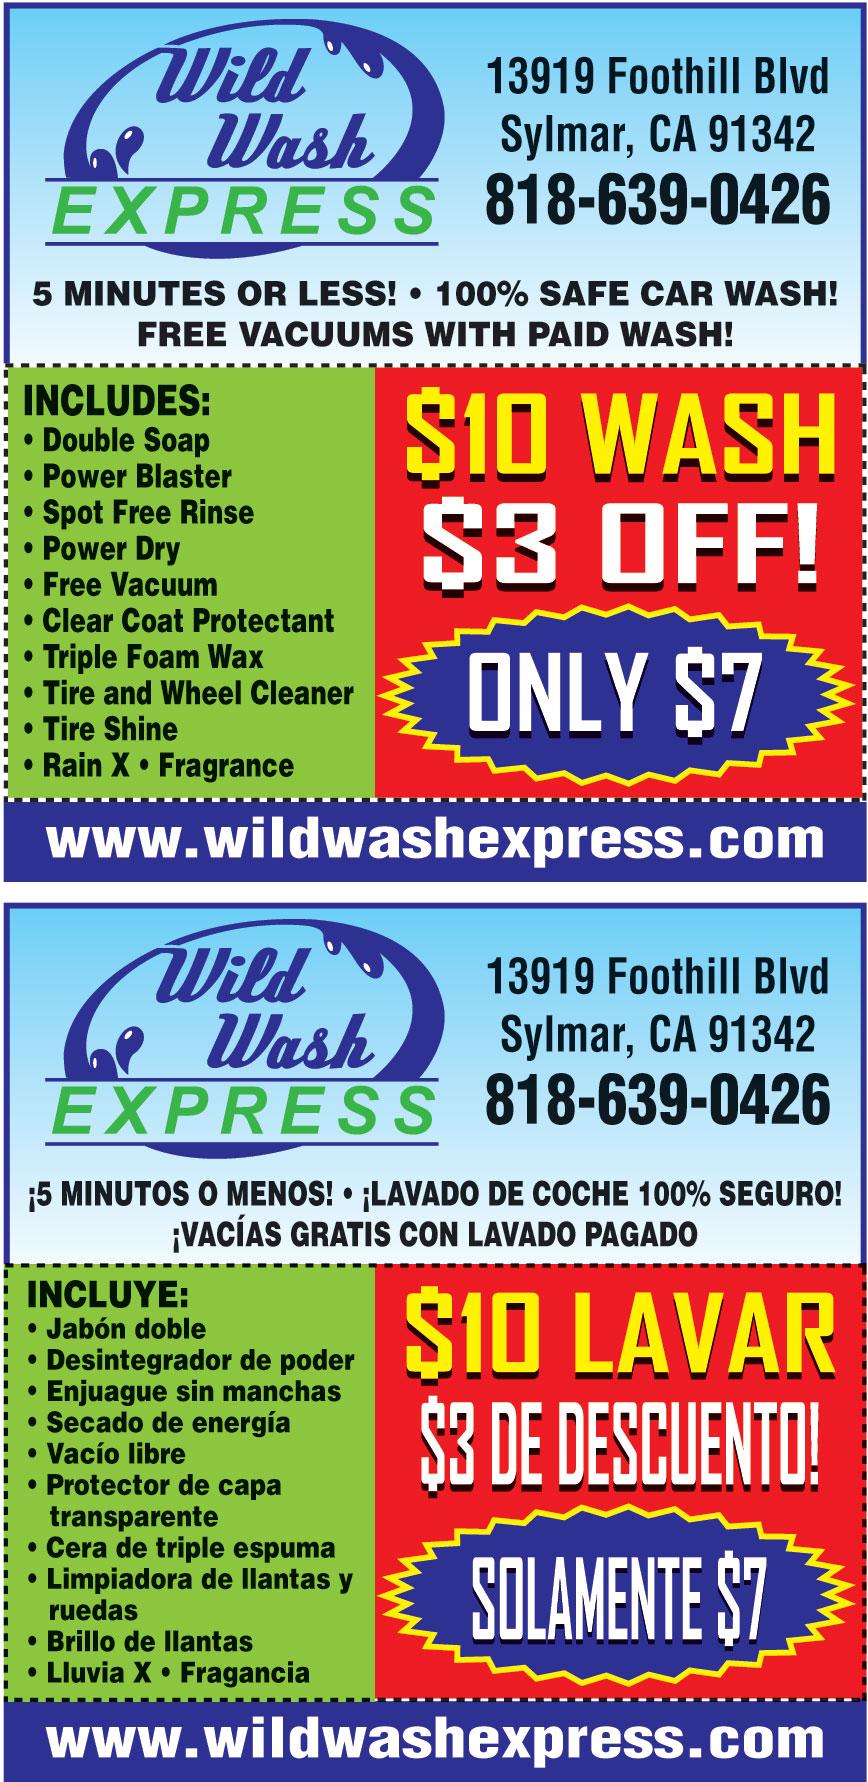 WILD WASH EXPRESS II